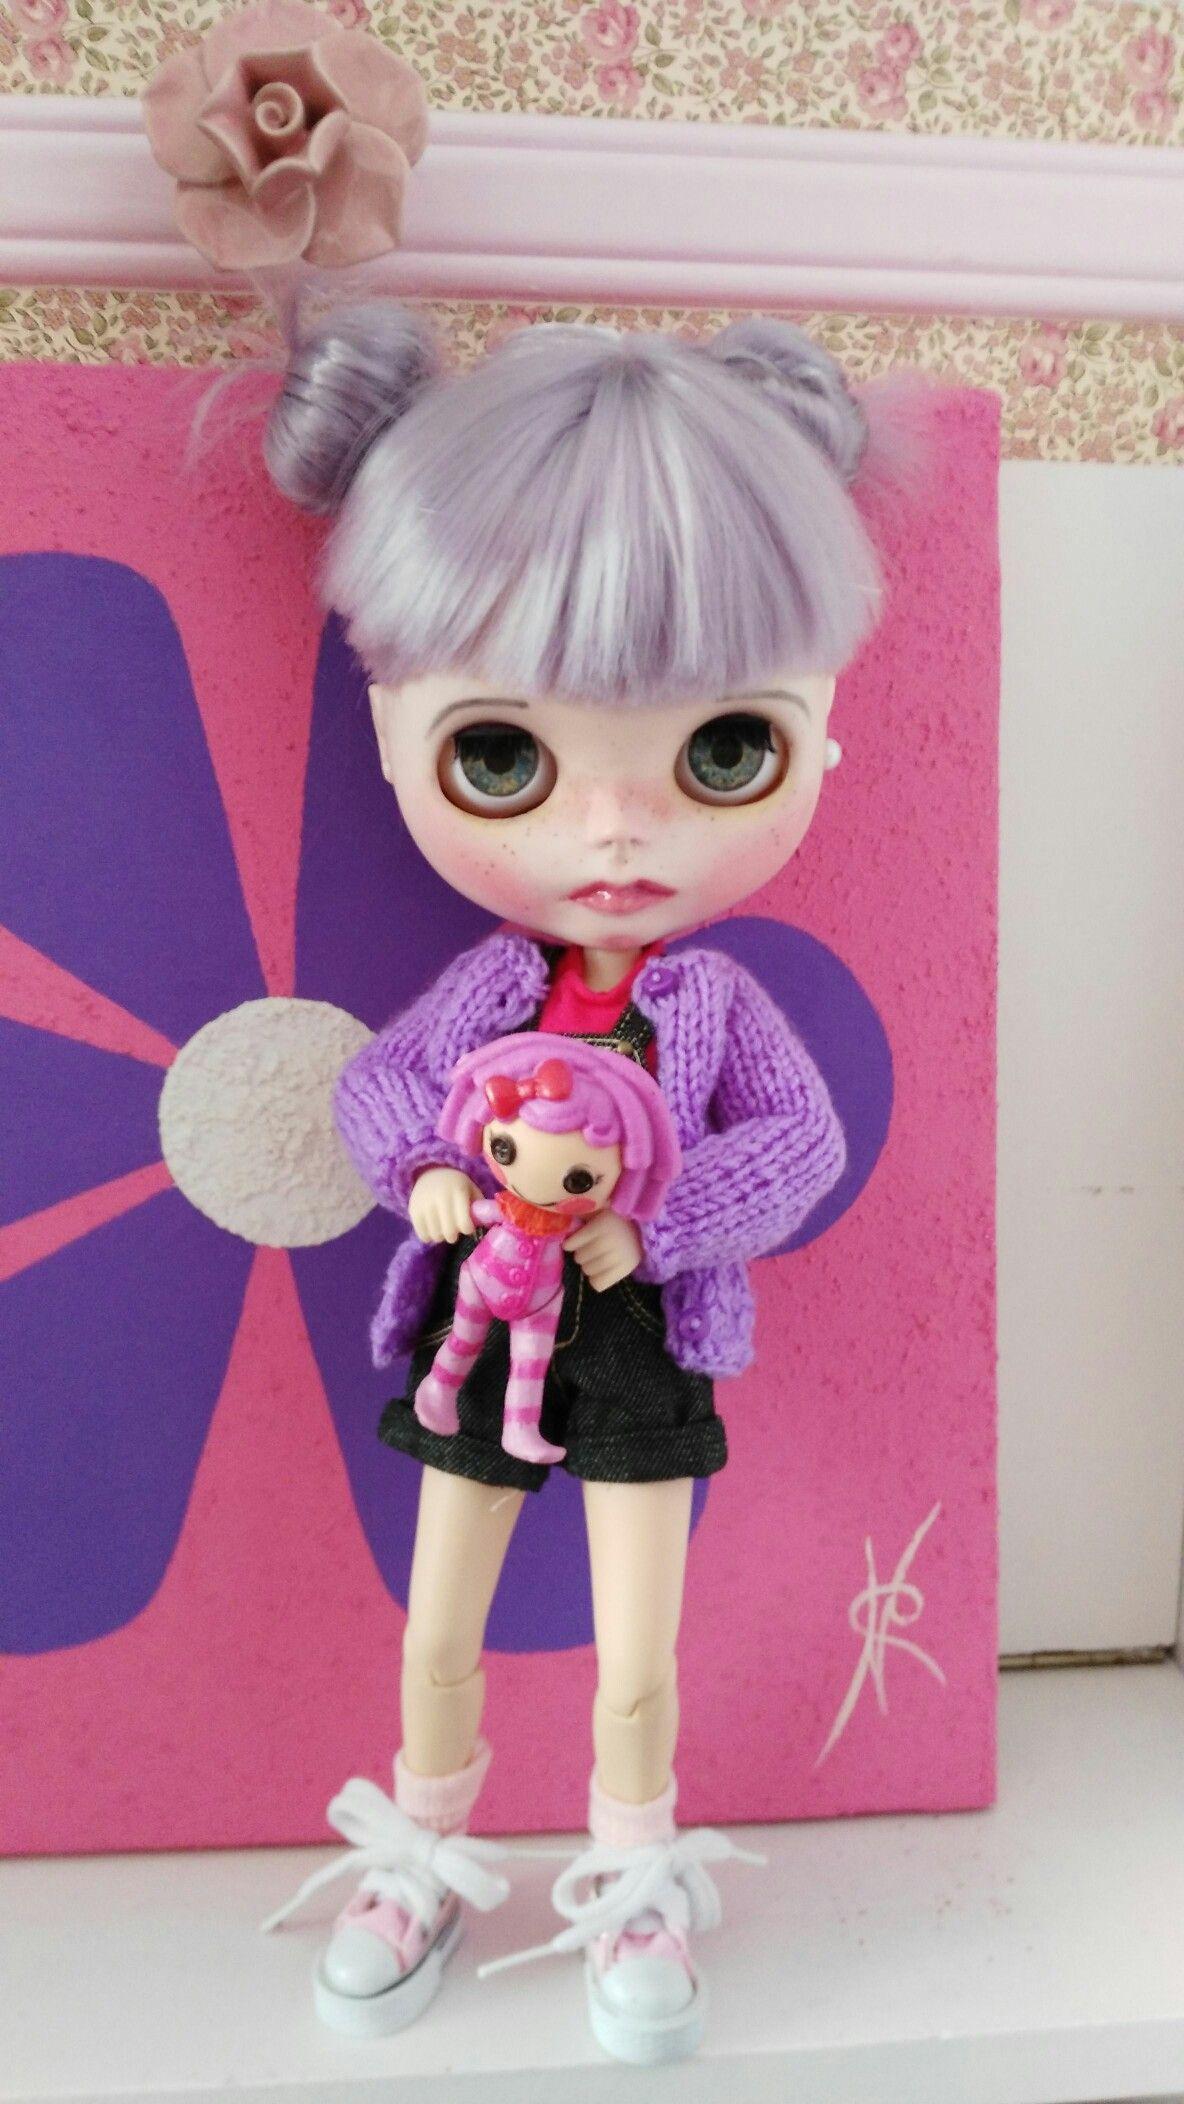 Pin de Liza Jacobe en Gorgeous dolls; Adorable blythe ...